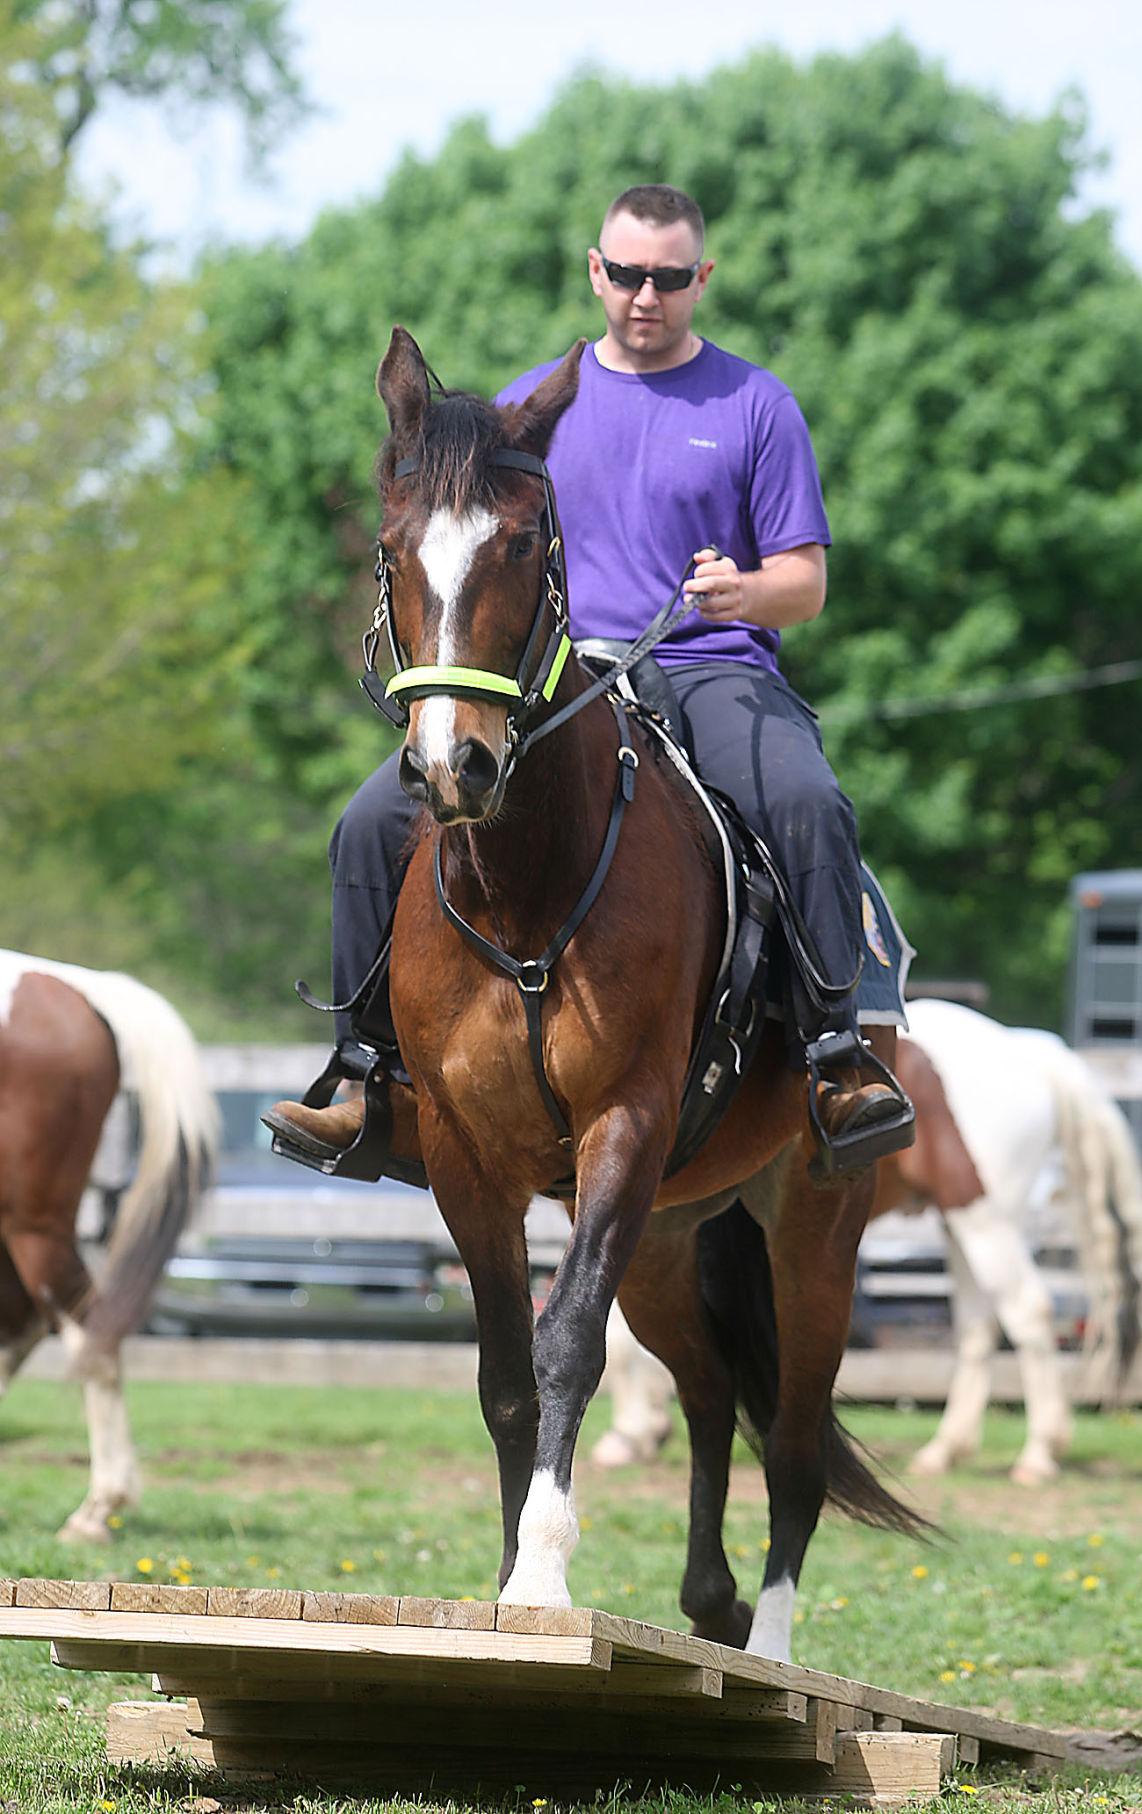 Kpd Mounted Patrol Rides Again News Kokomotribune Com